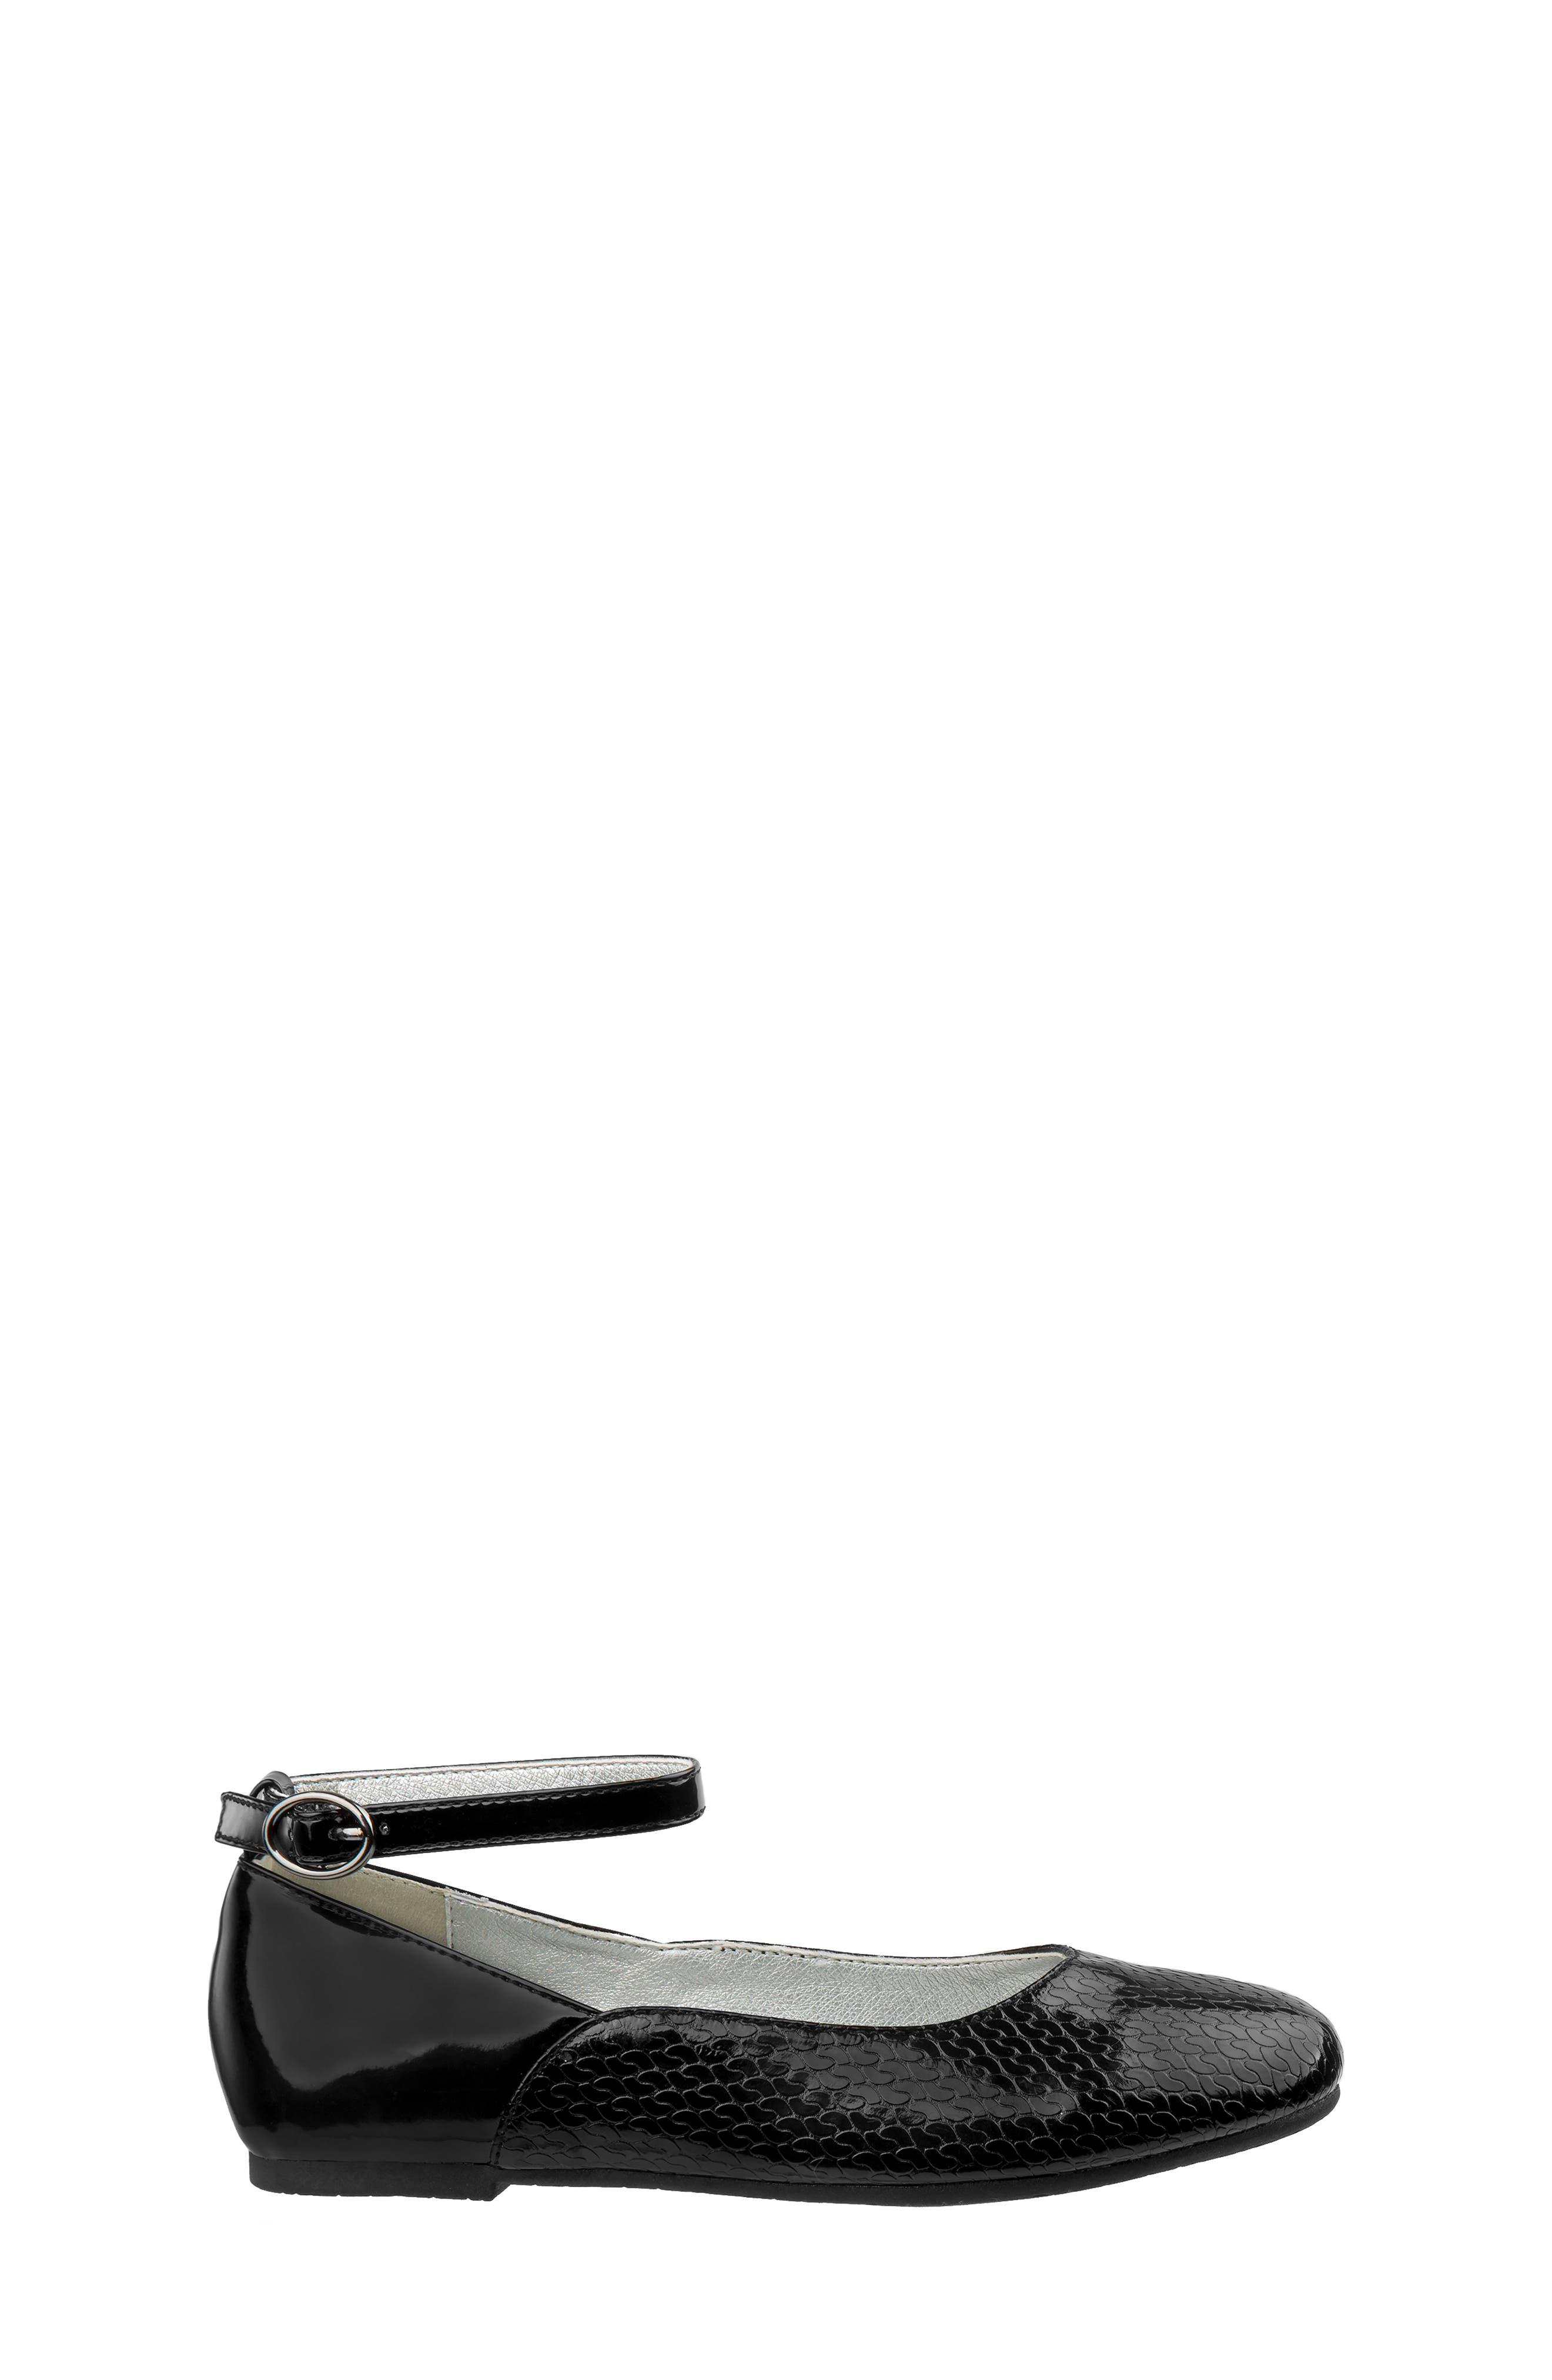 KENSIE GIRL,                             Ankle Strap Ballerina Flat,                             Alternate thumbnail 2, color,                             BLACK FAUX PATENT